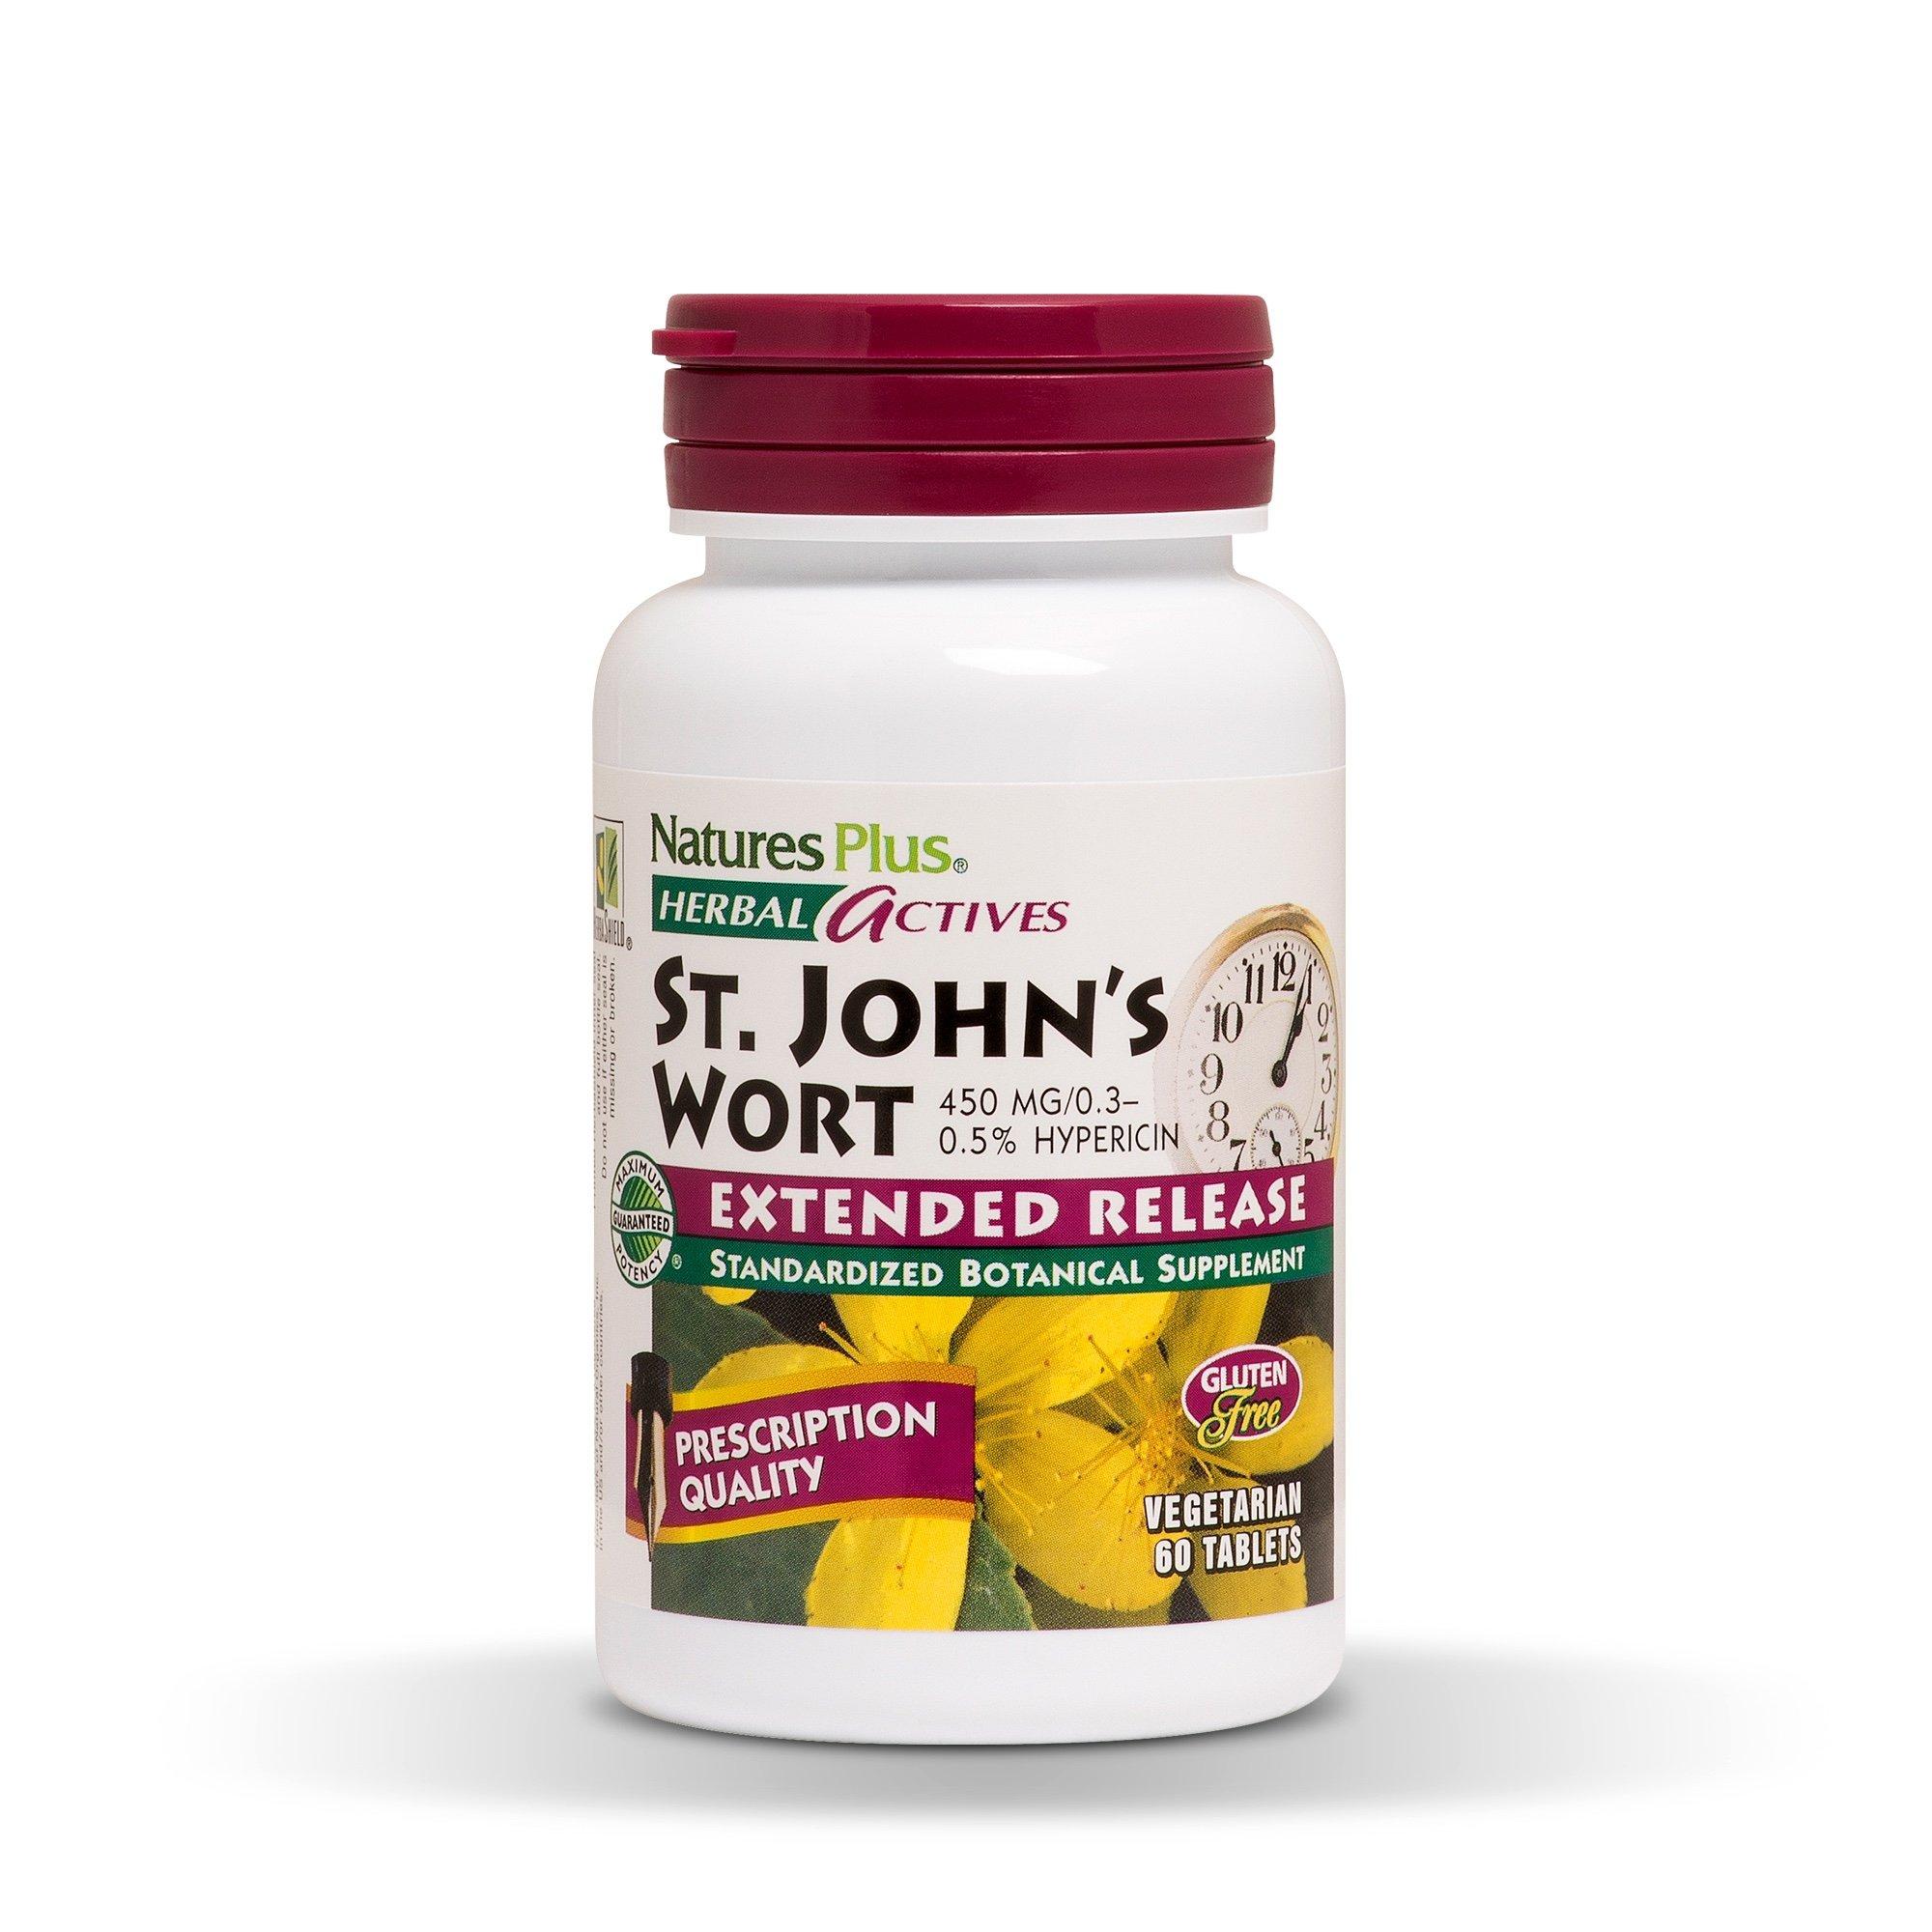 NaturesPlus Herbal Actives St John's Wort, Extended Release - 450 mg, 60 Vegan Tablets - Natural Mood Enhancer Supplement - Vegetarian, Gluten-Free - 60 Servings by Nature's Plus